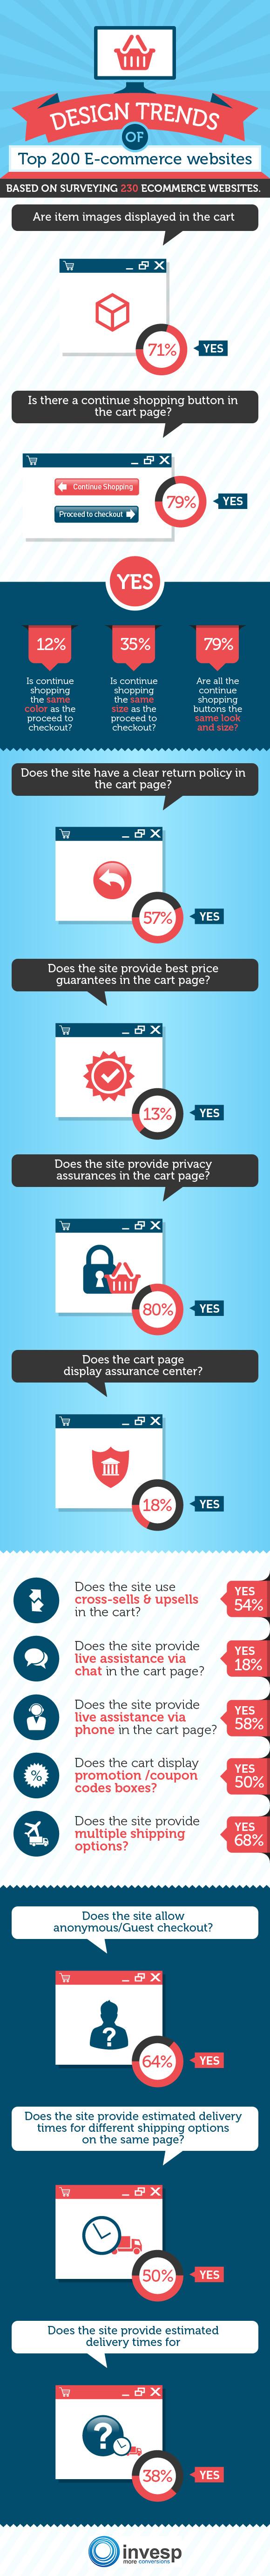 Design Trends of Top 200 E-commerce Websites [Infographic]